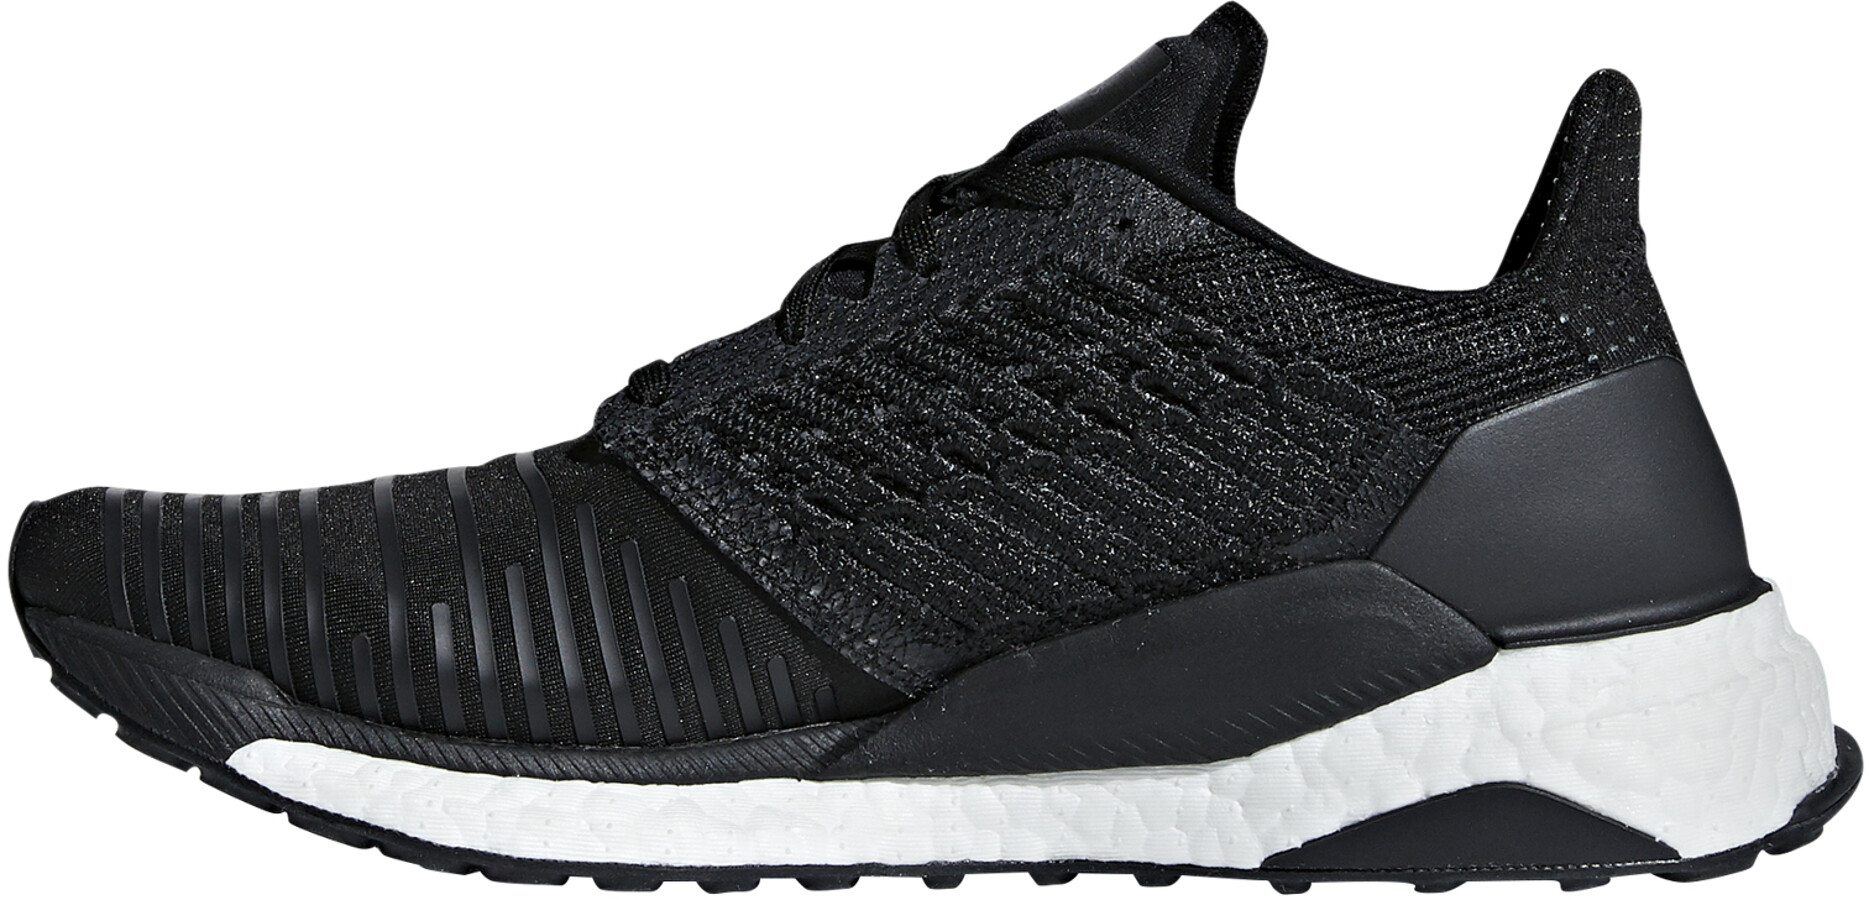 218c409d34 adidas Solar Boost Running Shoes Women black at Bikester.co.uk